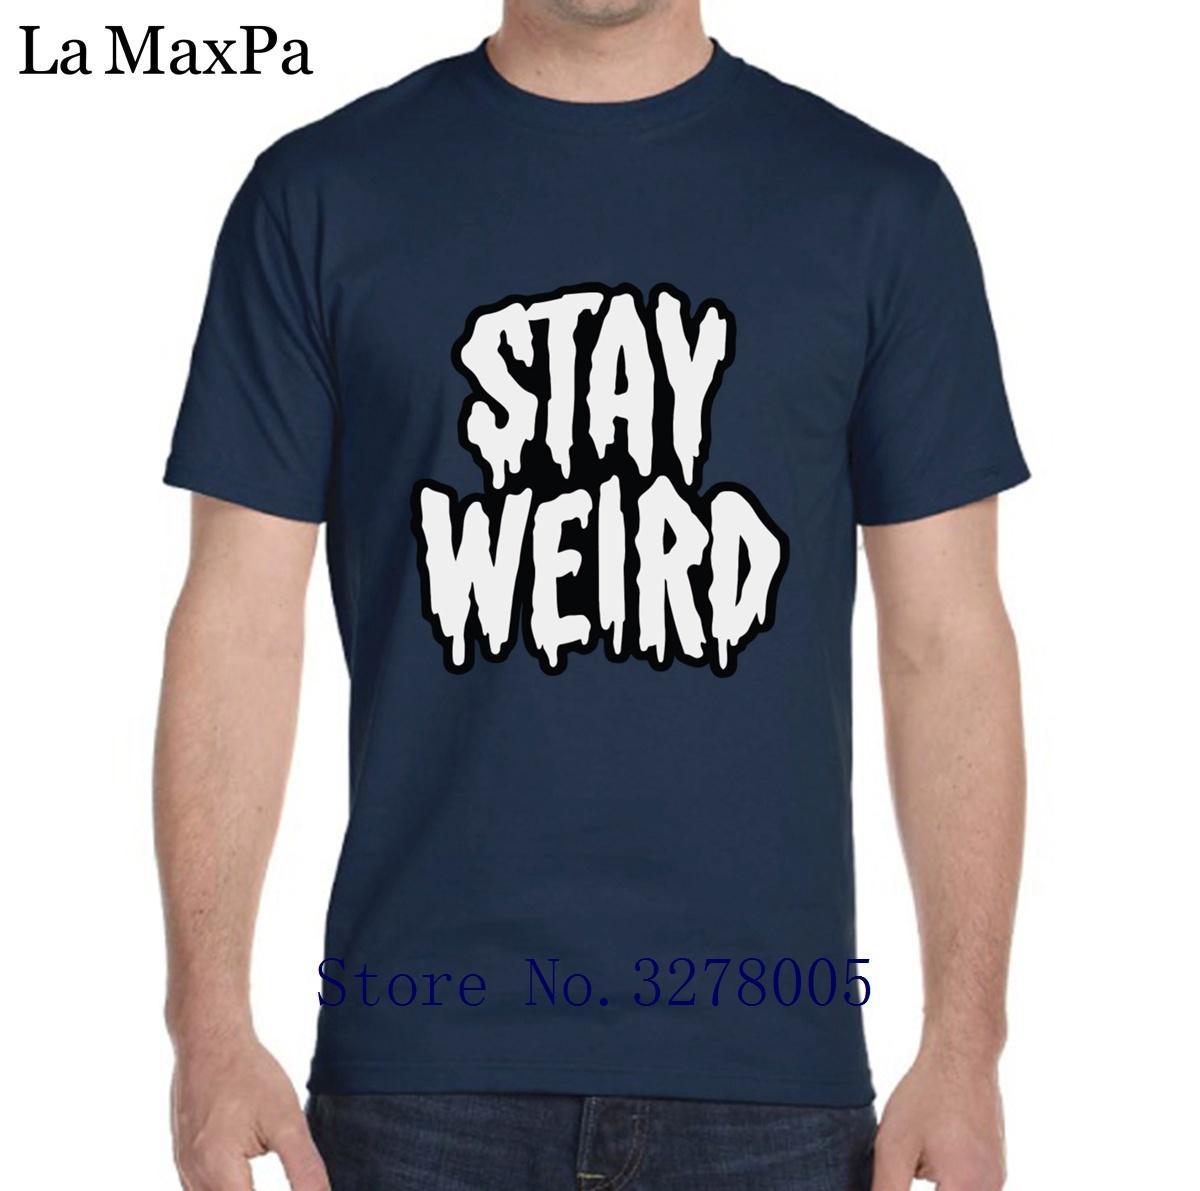 8b9563799 Create T Shirt Men Clothes Funny Stay Weird T-Shirt Vintage 100% Cotton  Short Sleeve Men's Tshirt Euro Size S-3xl Famous